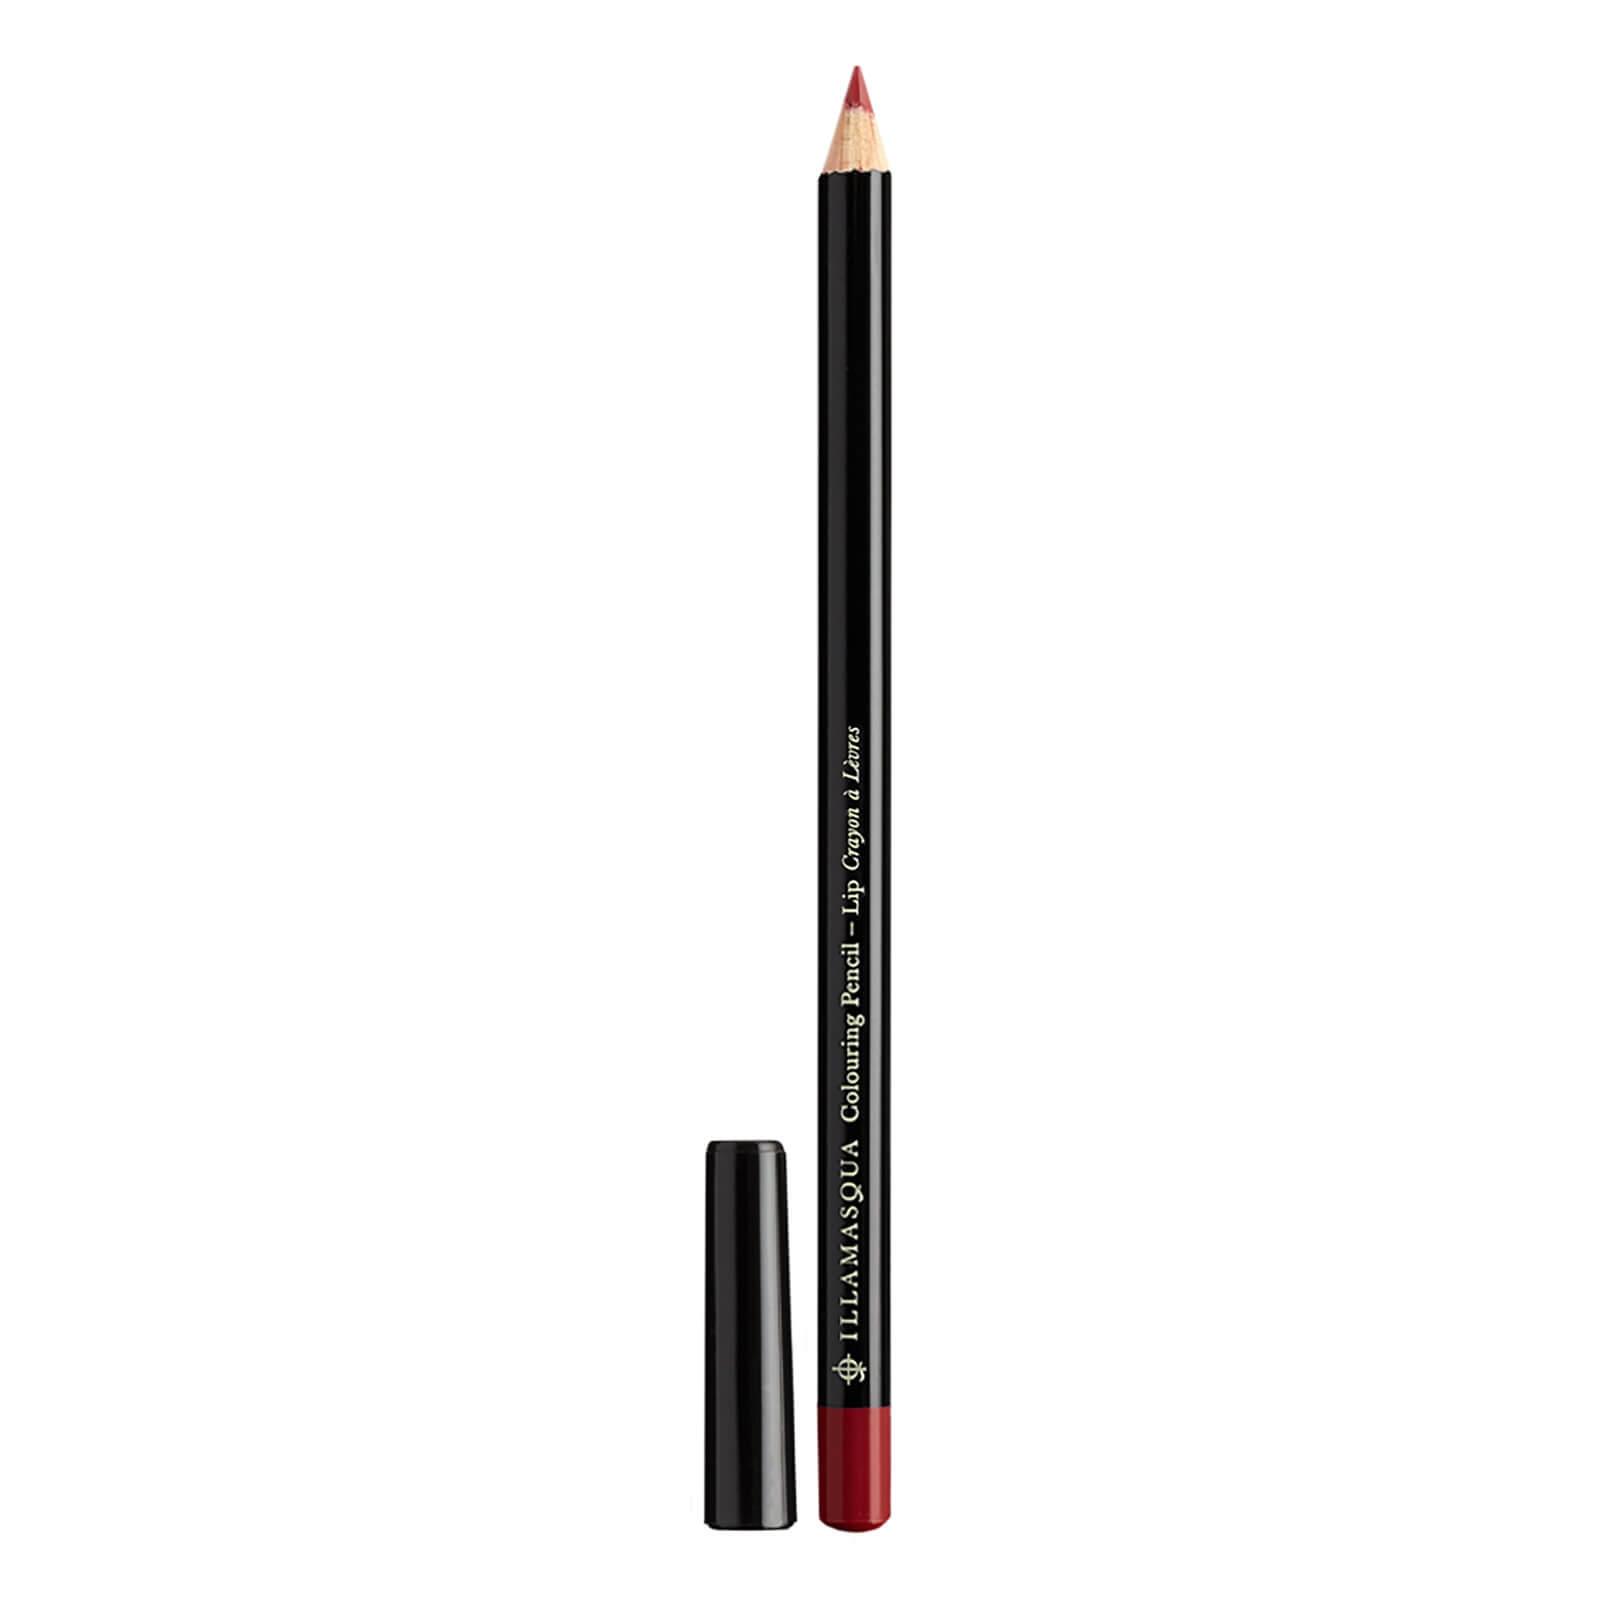 Illamasqua Colouring Lip Pencil Lust